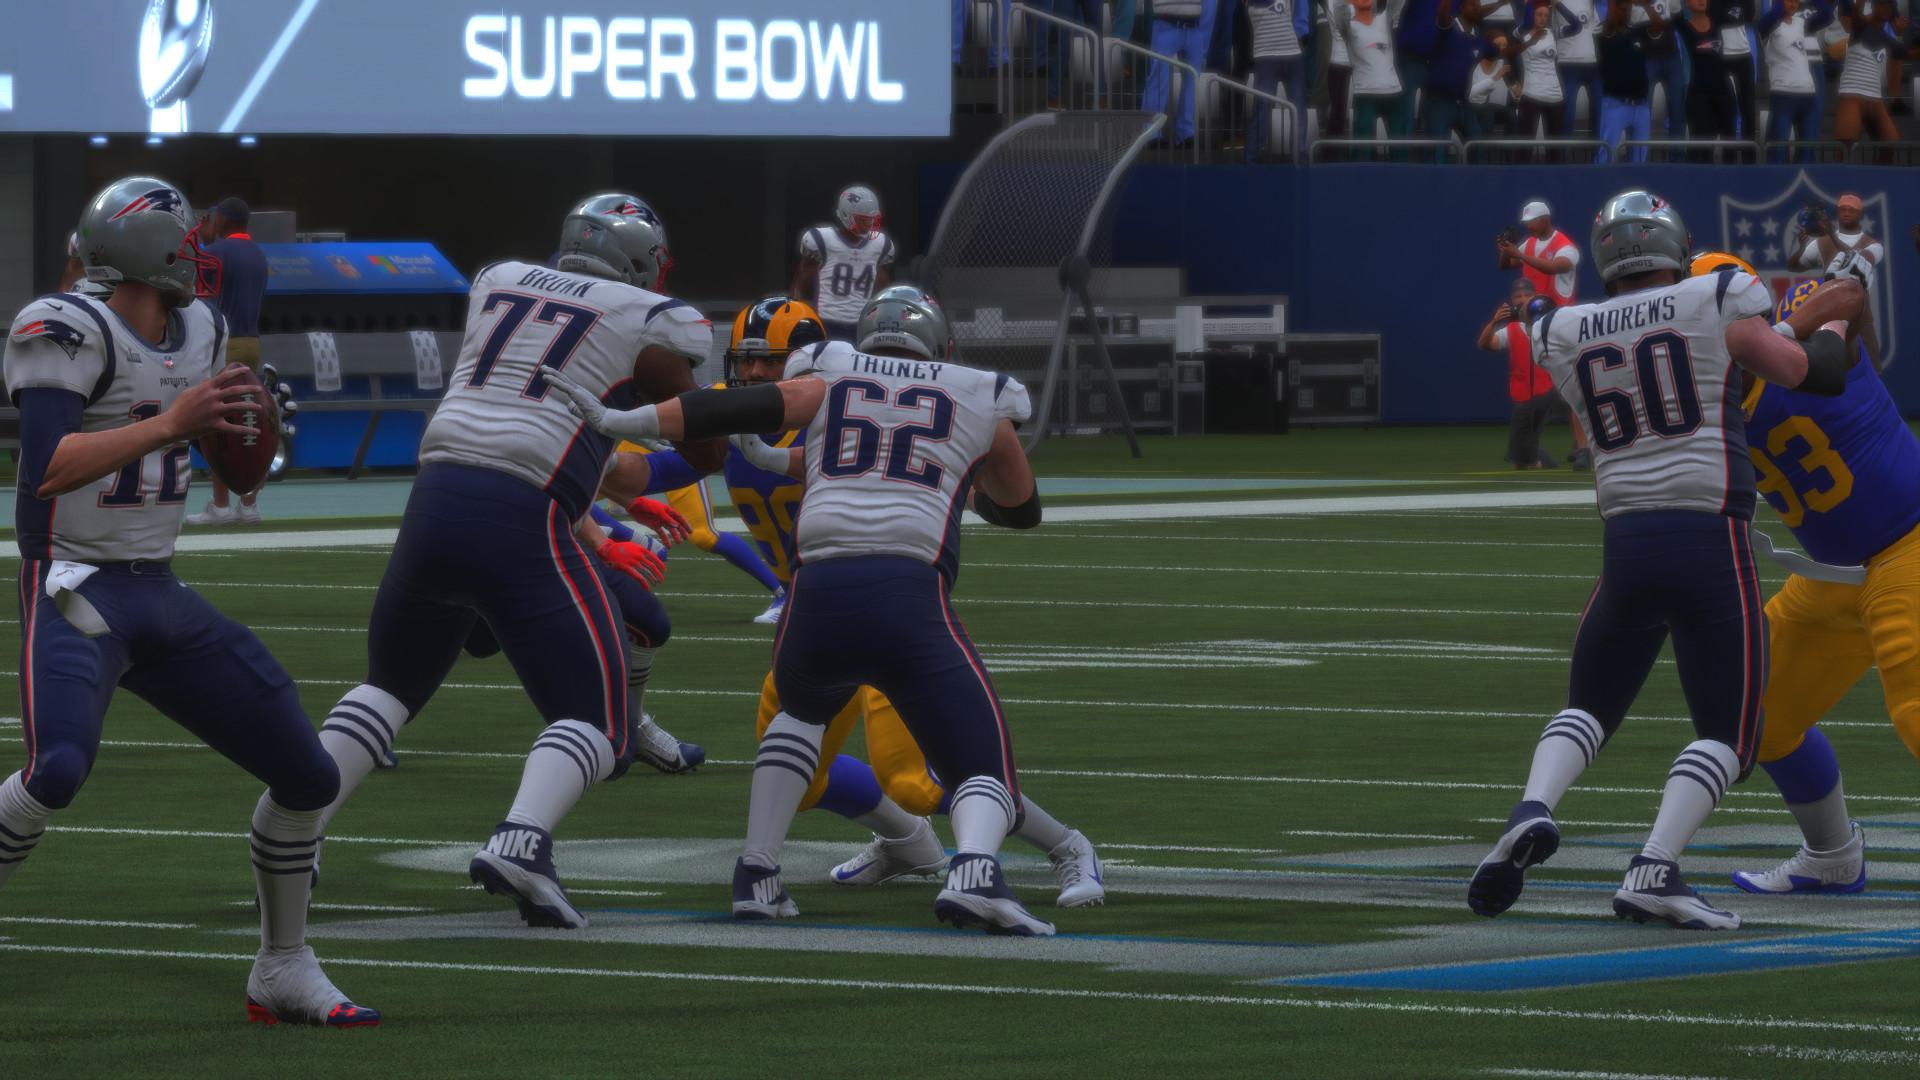 Madden NFL 19 Super Bowl LII Tom Brady